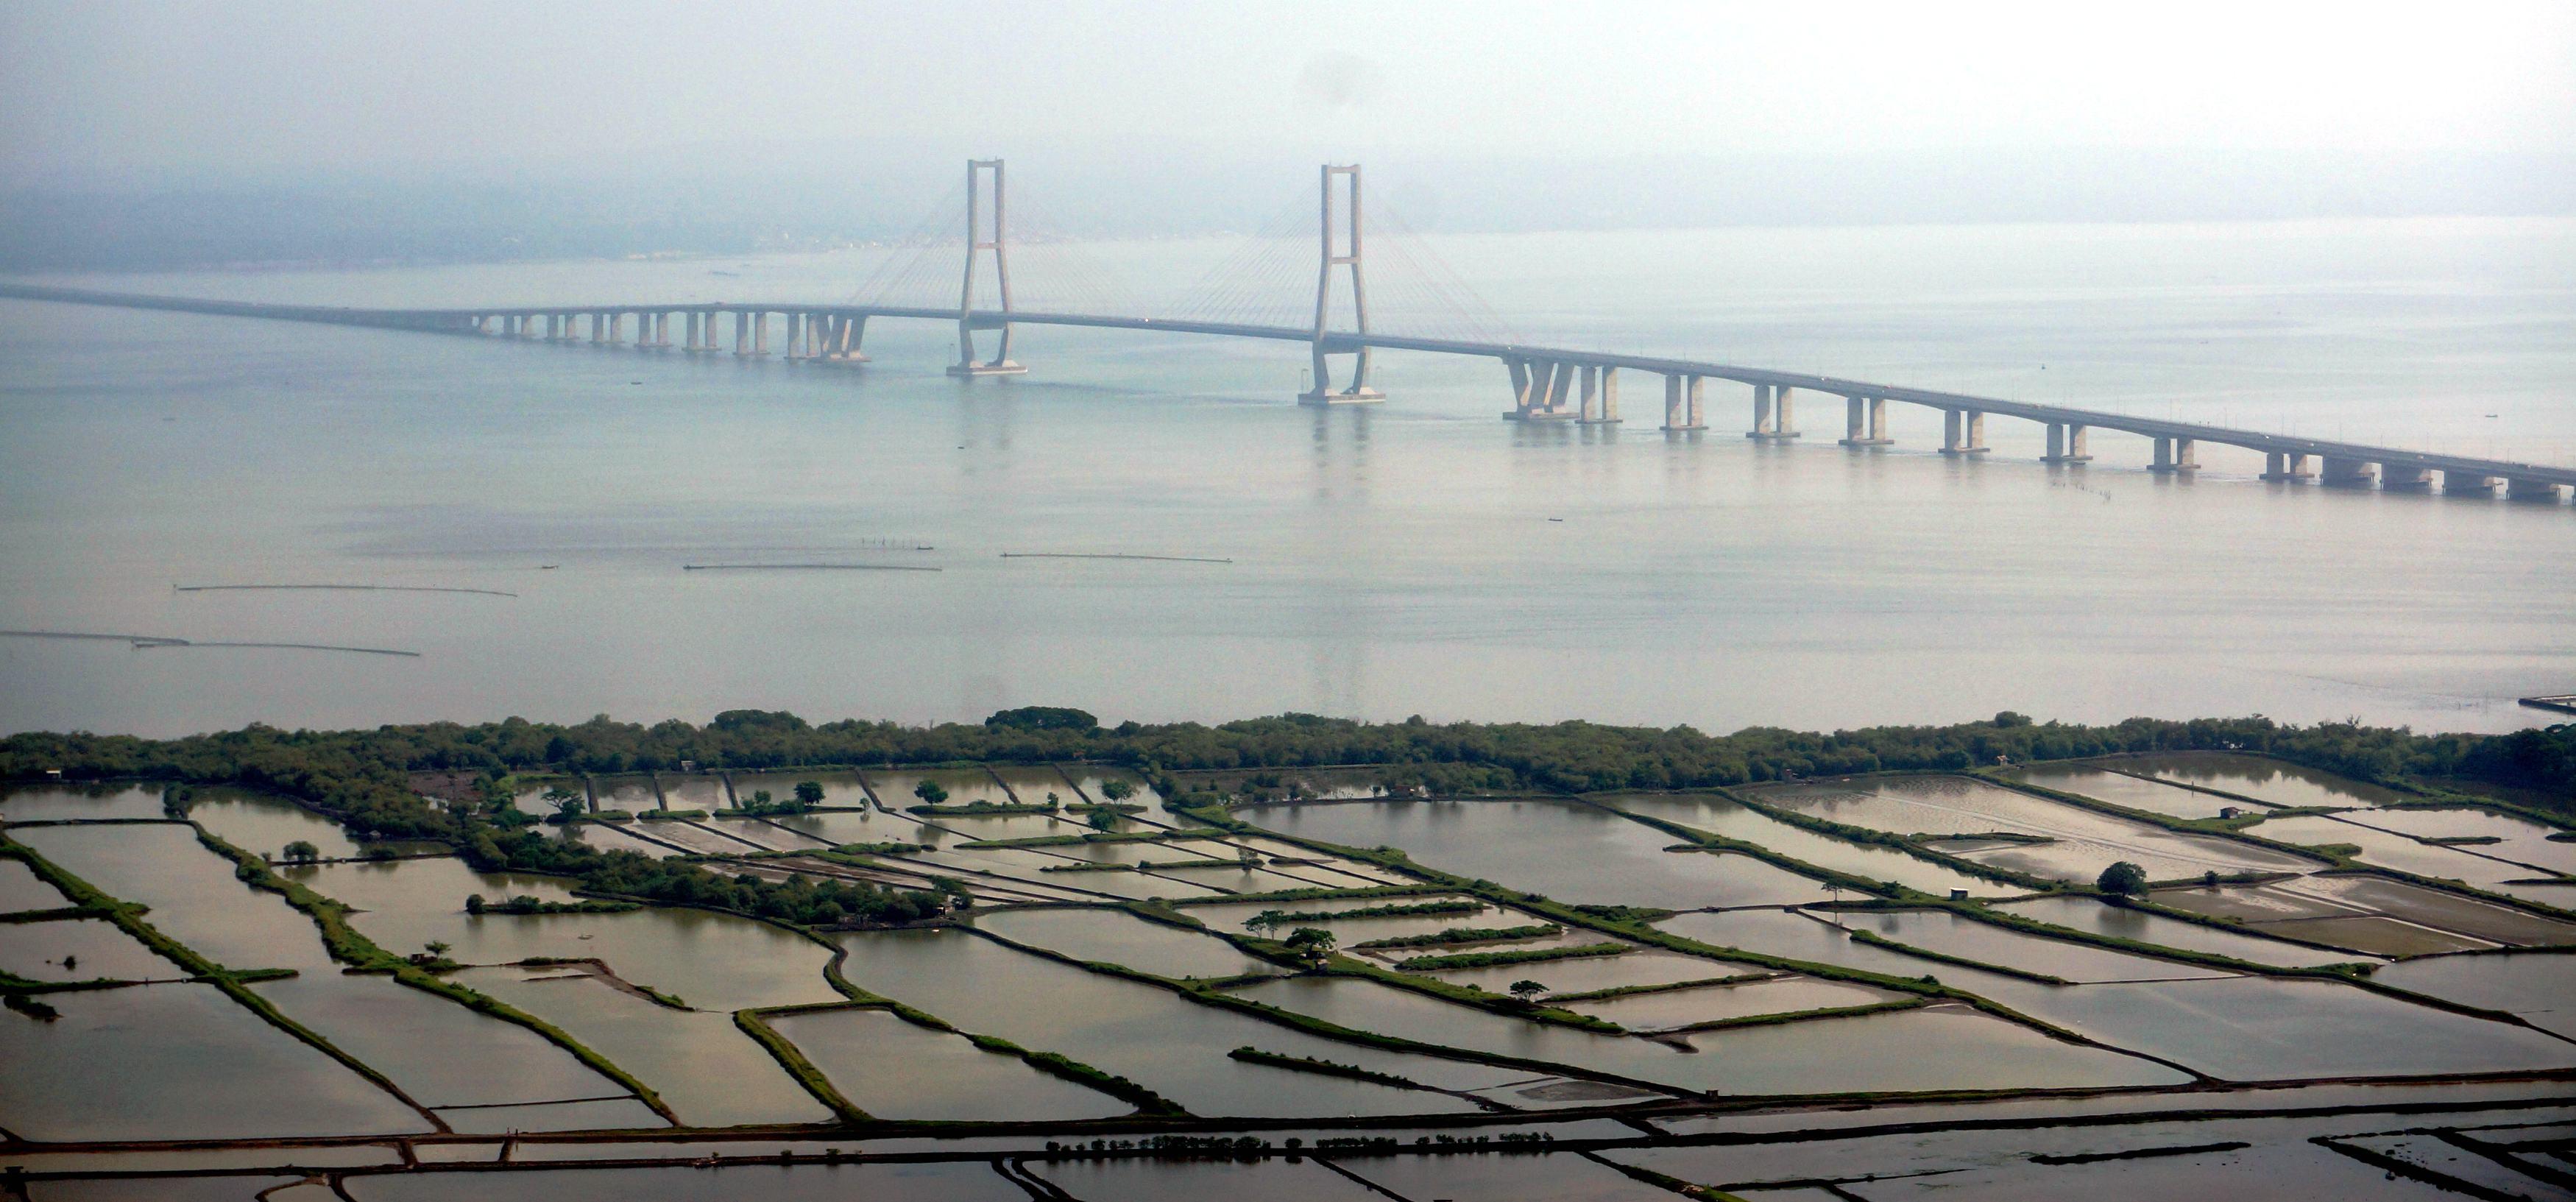 Pengembangan Kawasan Pantai Kenjeran Surabaya Berita Daerah Tambak Tak Jauh